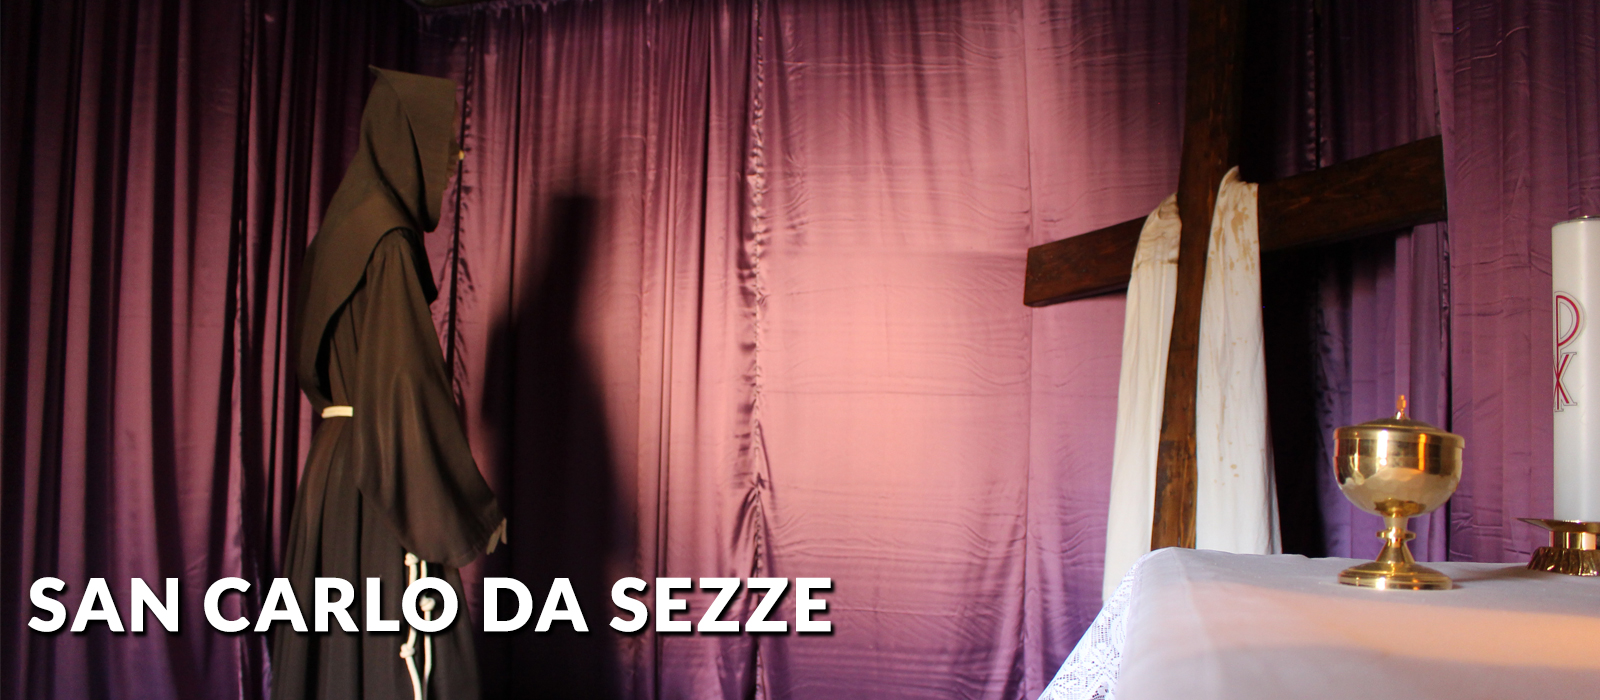 copertinasancarlodasezze-1600x700